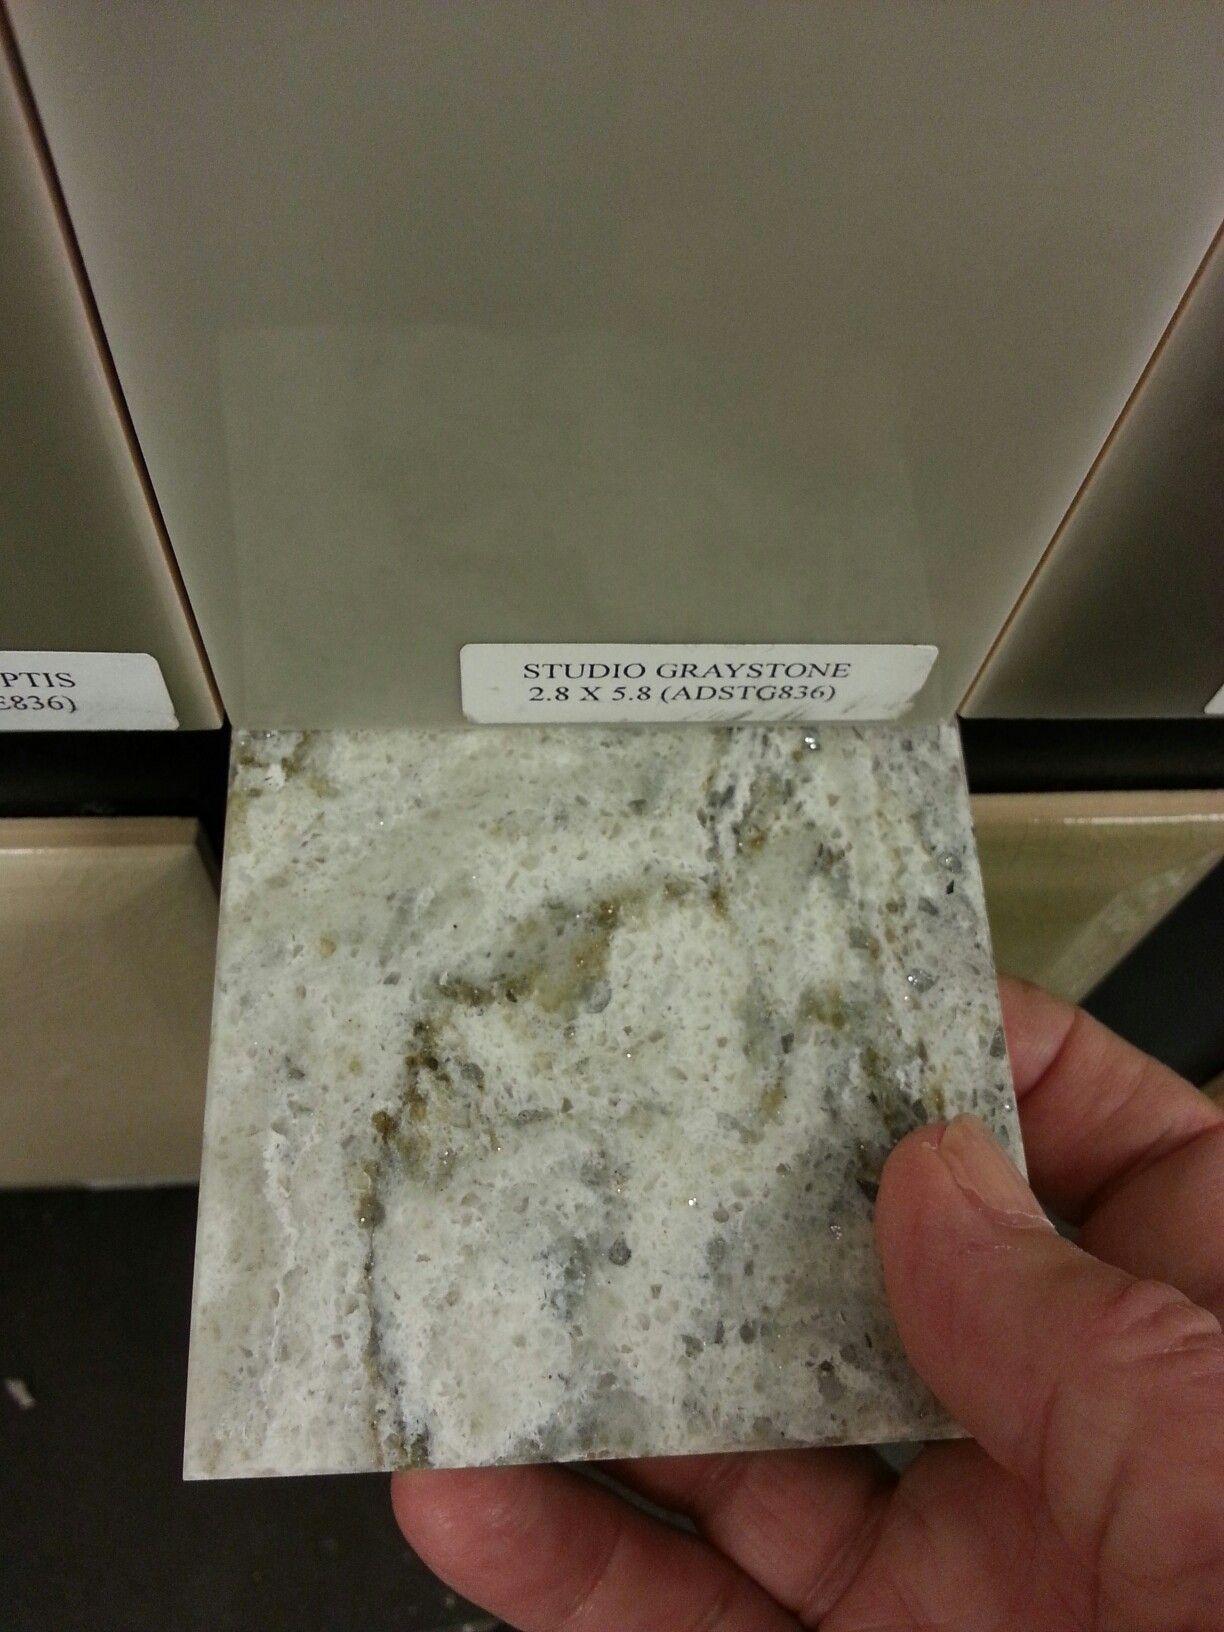 Studio Graystone subway tiles with Berwyn Cambria counters